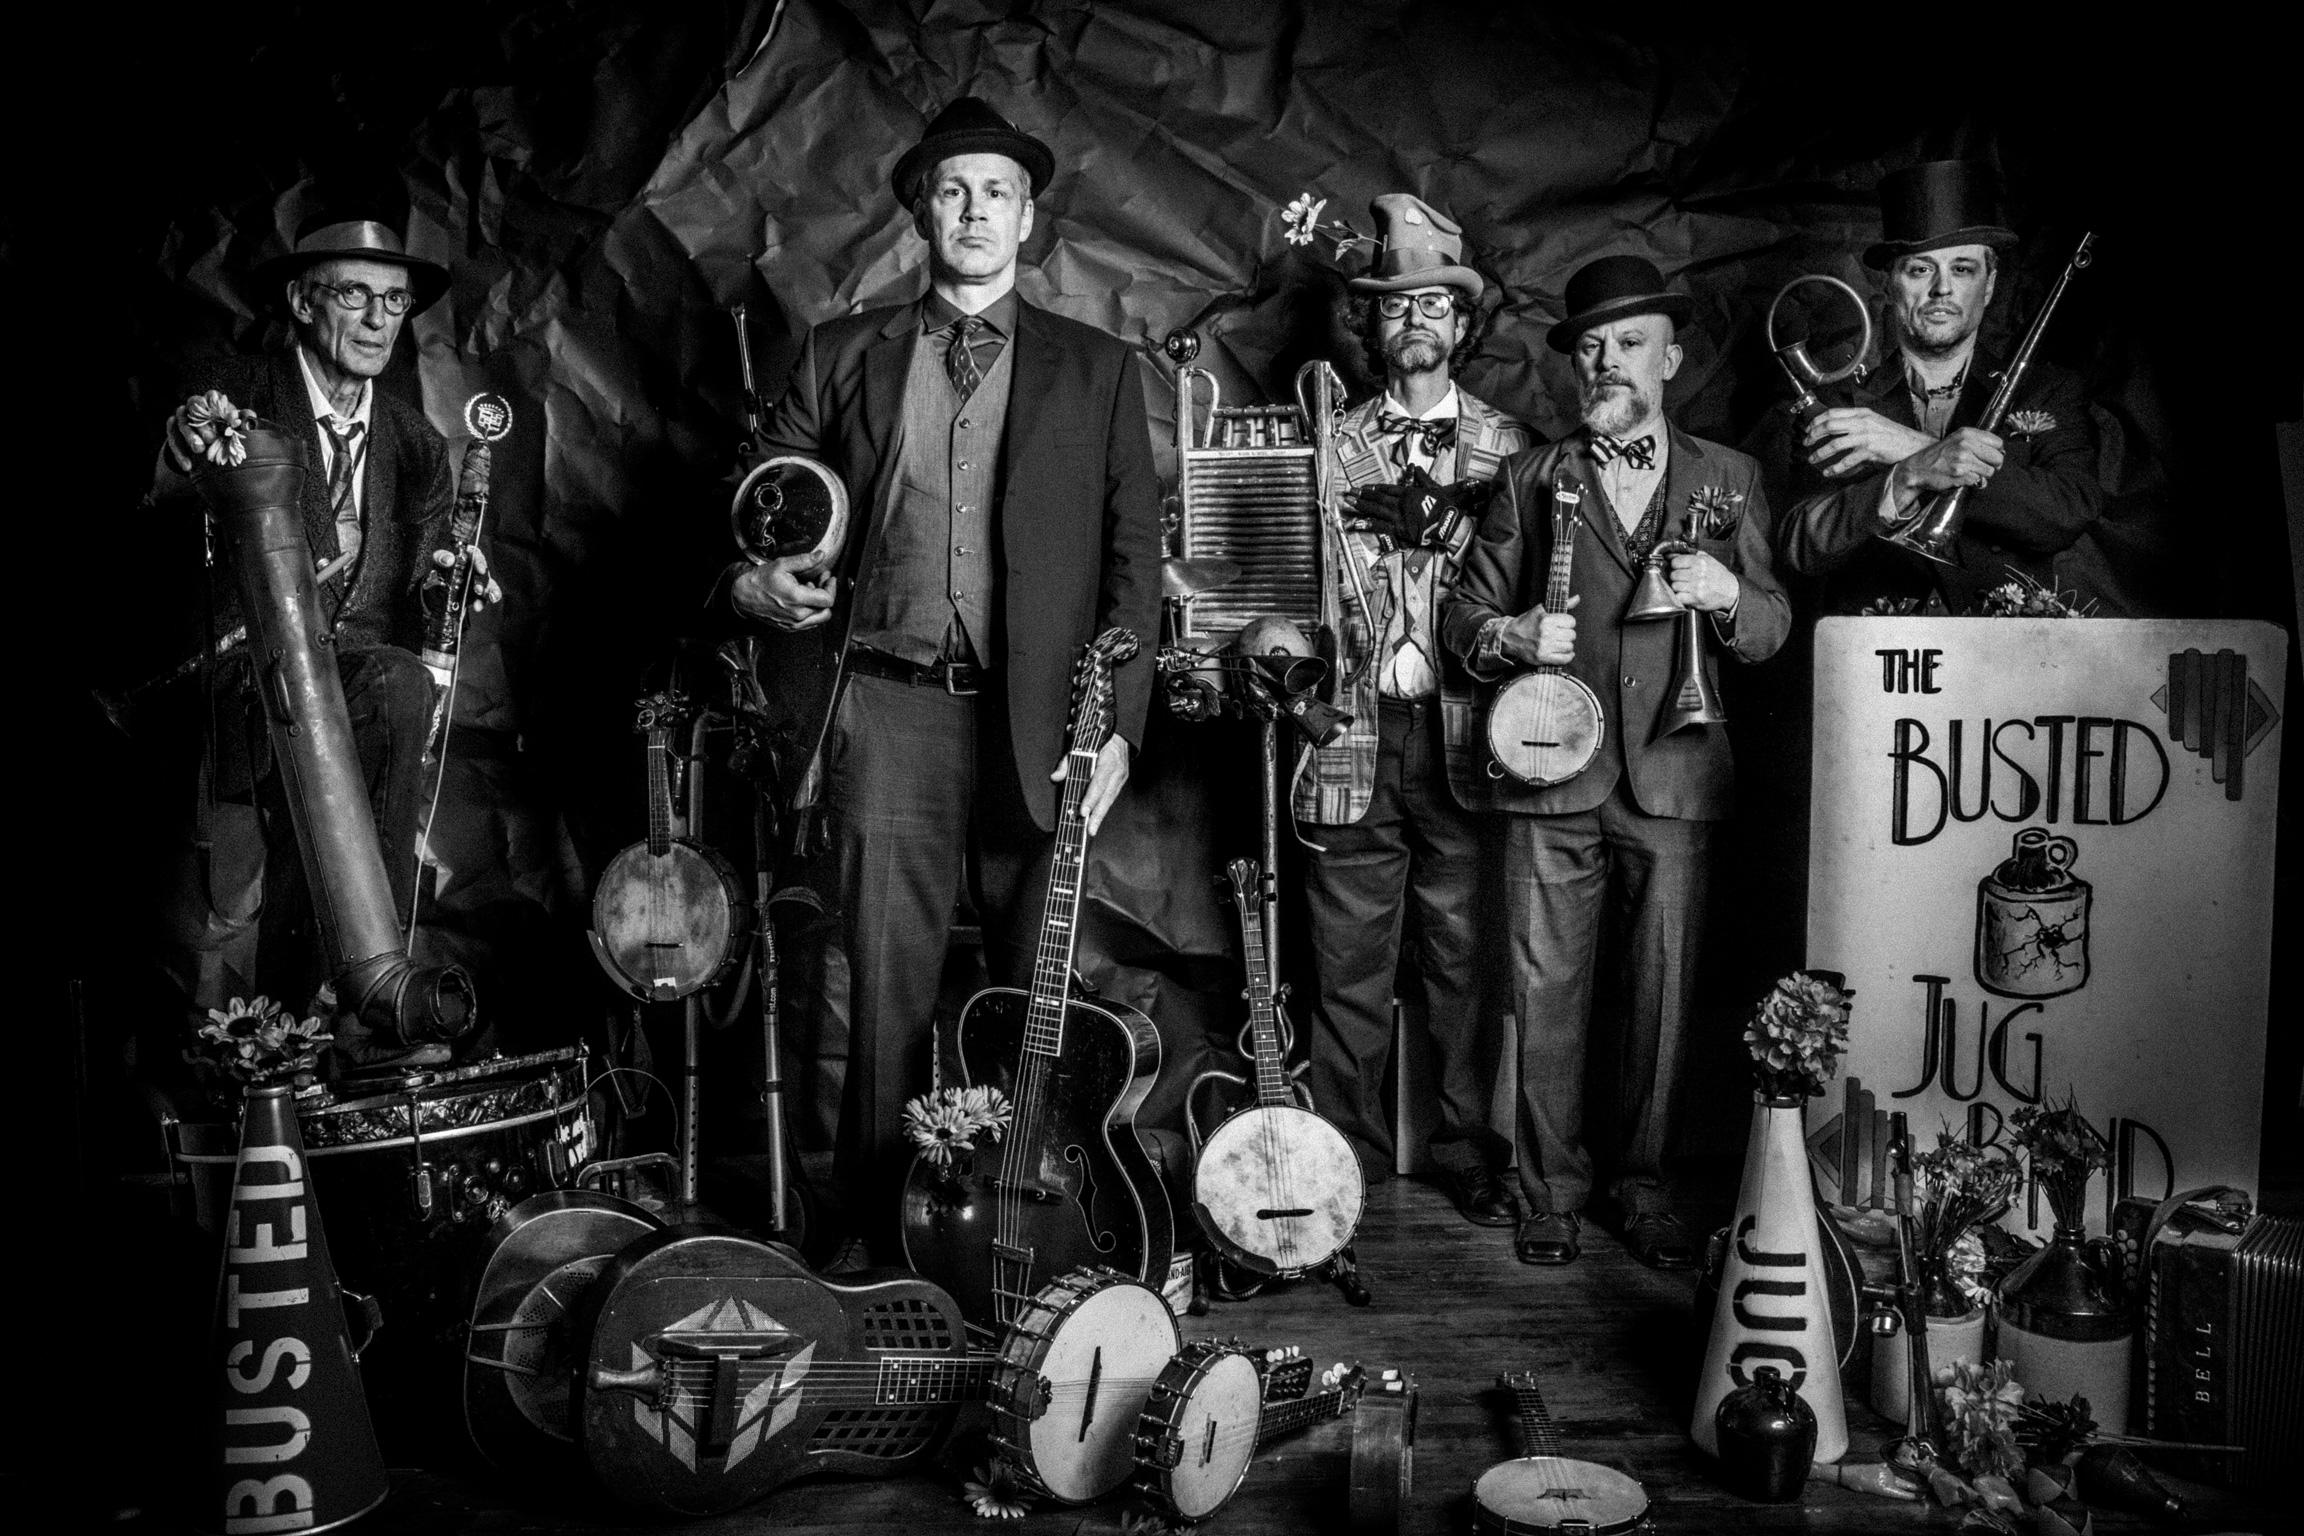 The Busted Jug Band 2018.